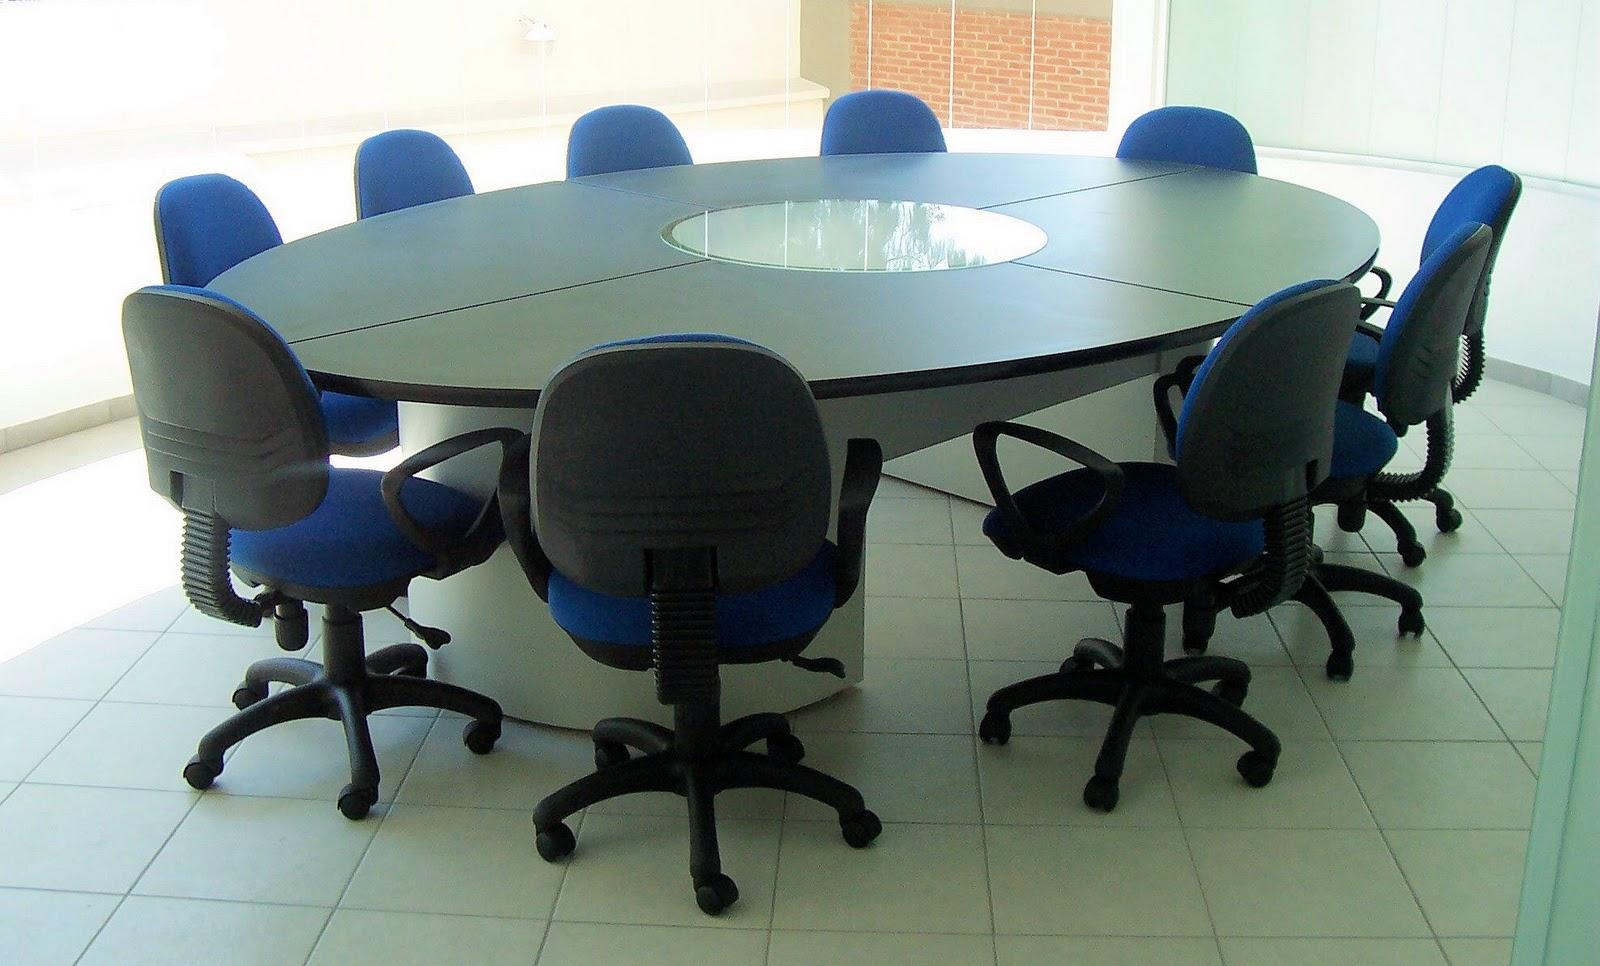 Muebles de oficina zaragoza excellent ofertas de ofix for Almacenes zaragoza muebles